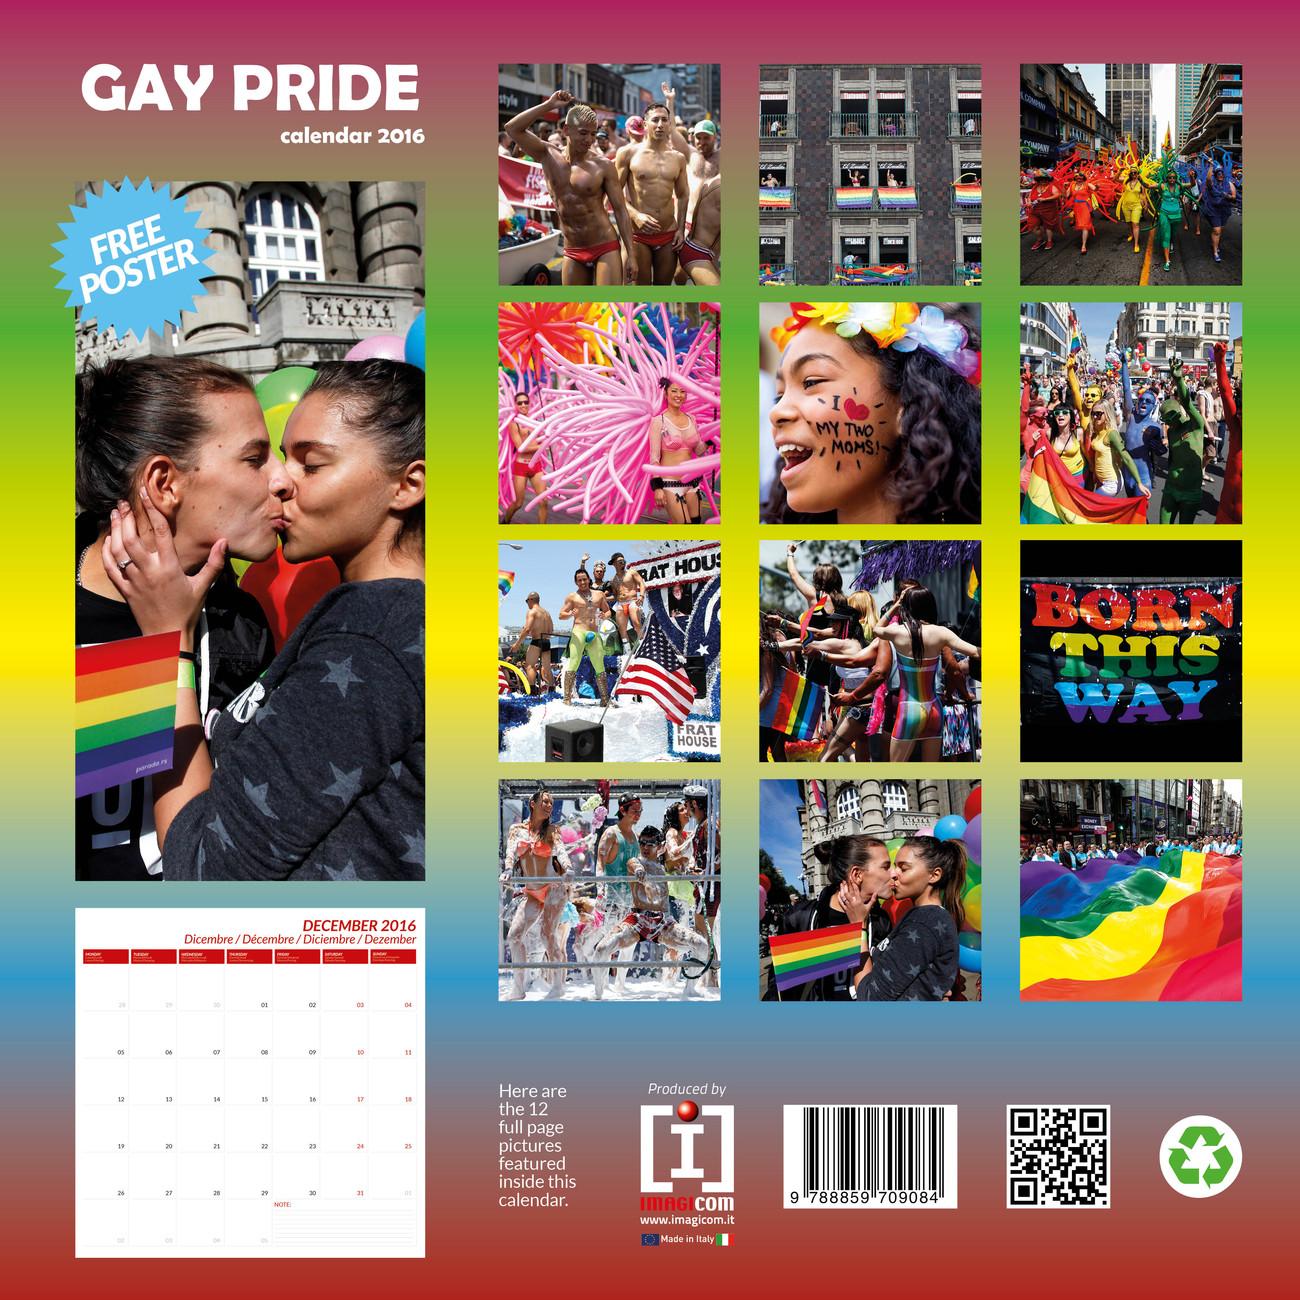 Gay Pride Calendar 2020 Gay Pride   Calendars 2020 on UKposters/Abposters.com